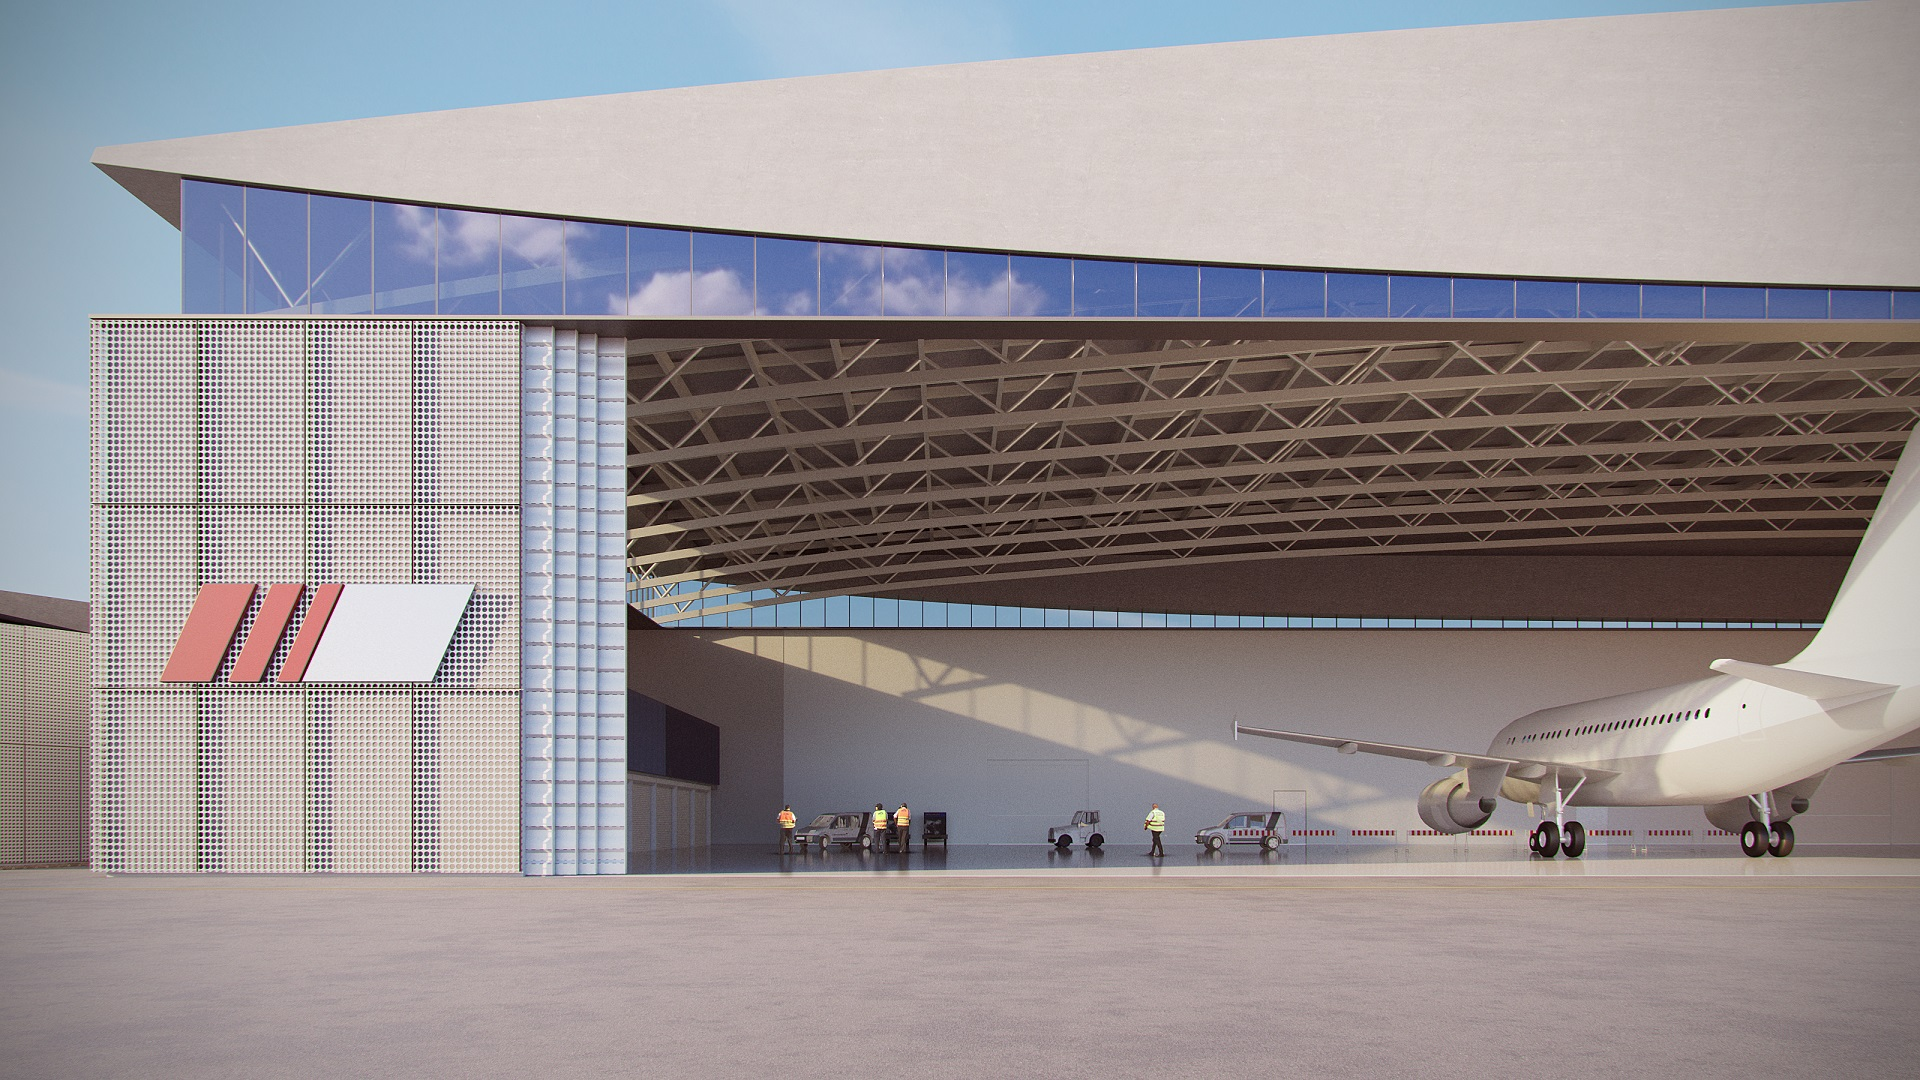 Gama Aviation unveils Sharjah FBO concept